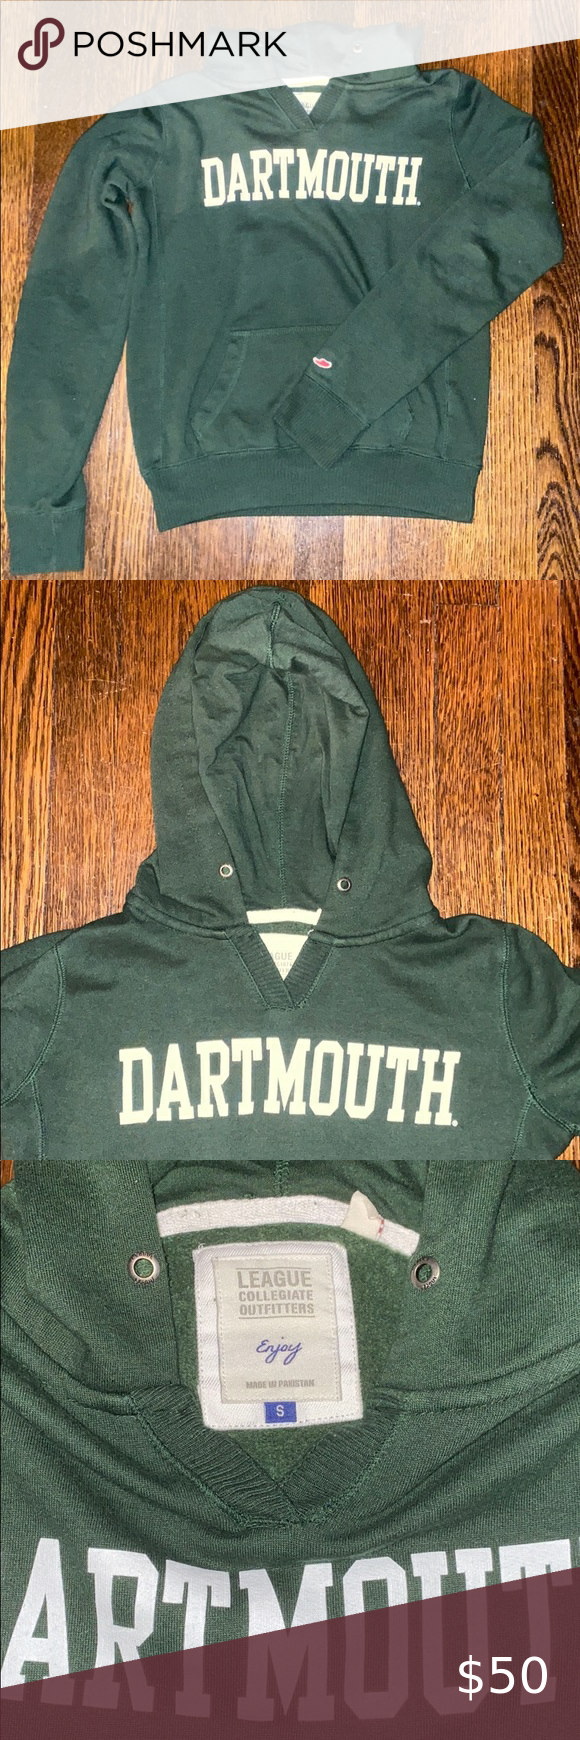 Dartmouth Sweatshirt Super Soft Warm Lightly Worn But In Great Condition Sweaters Sweatshirts Sweaters For Women Sweaters [ 1740 x 580 Pixel ]